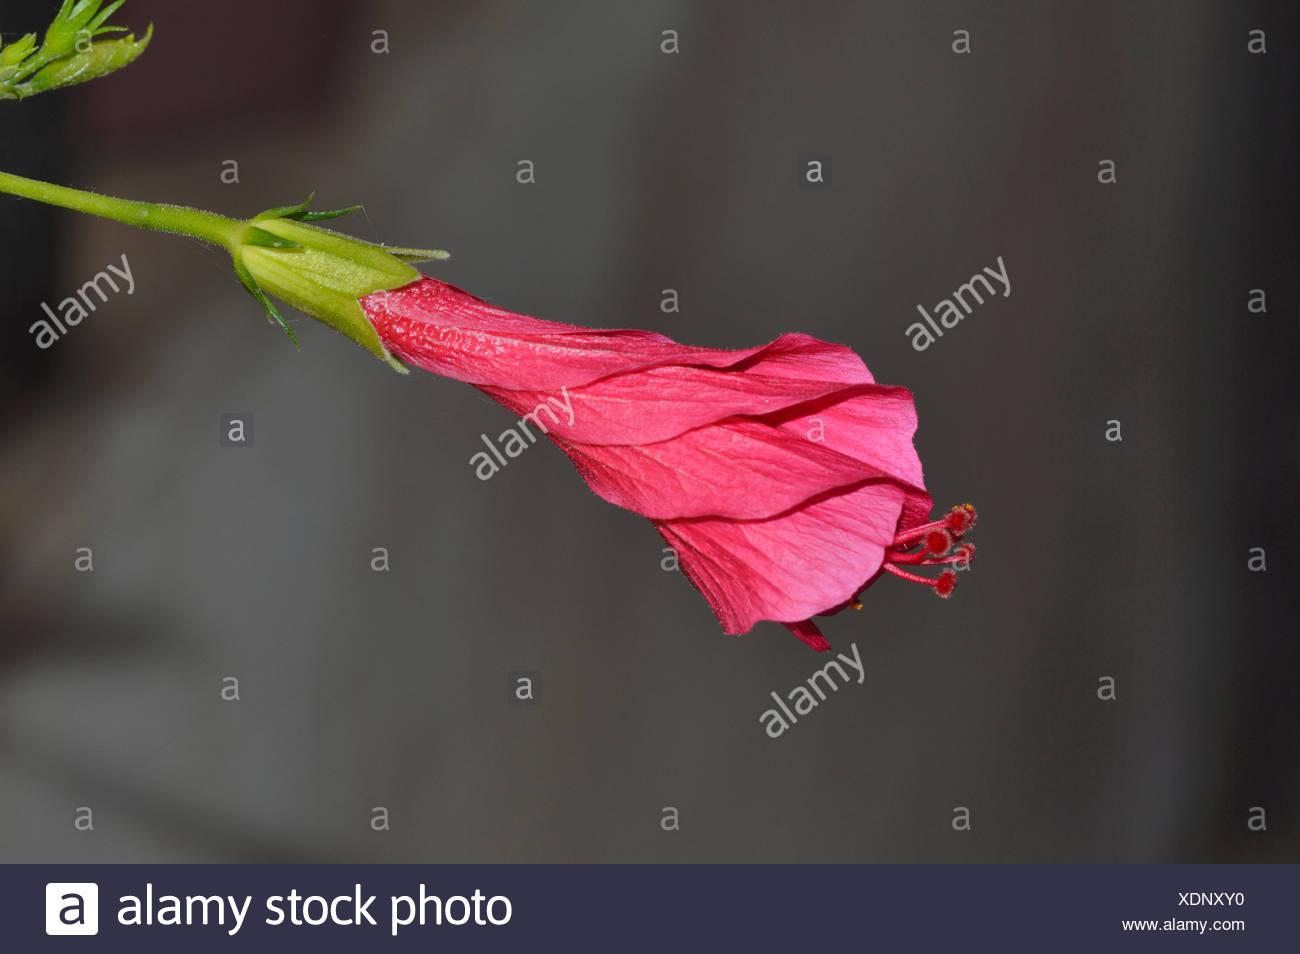 Bud of a hibiscus pune stock photo 283838548 alamy bud of a hibiscus pune izmirmasajfo